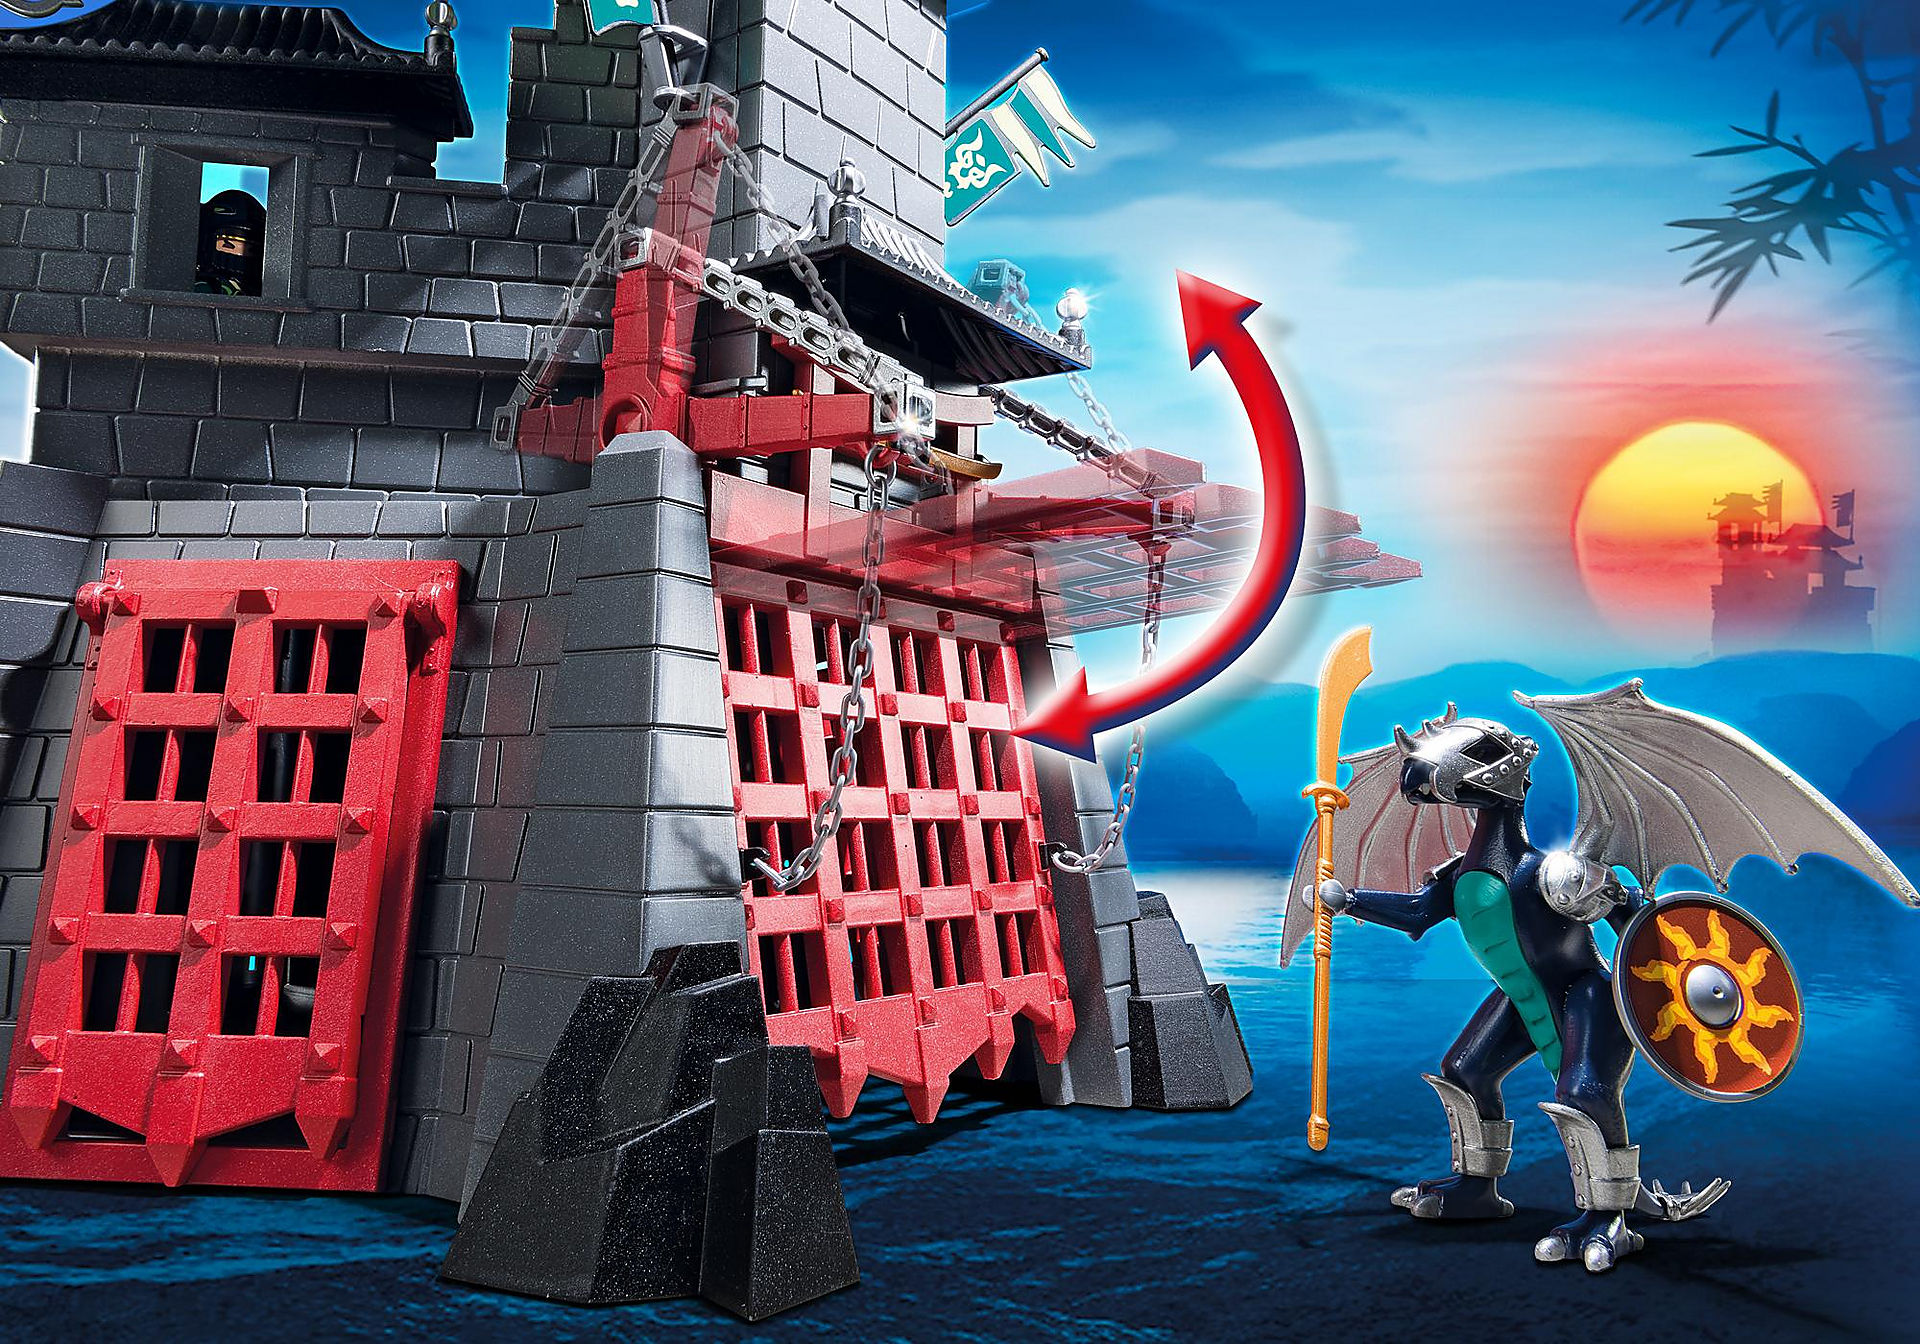 http://media.playmobil.com/i/playmobil/5480_product_extra3/Forte segreto del Drago